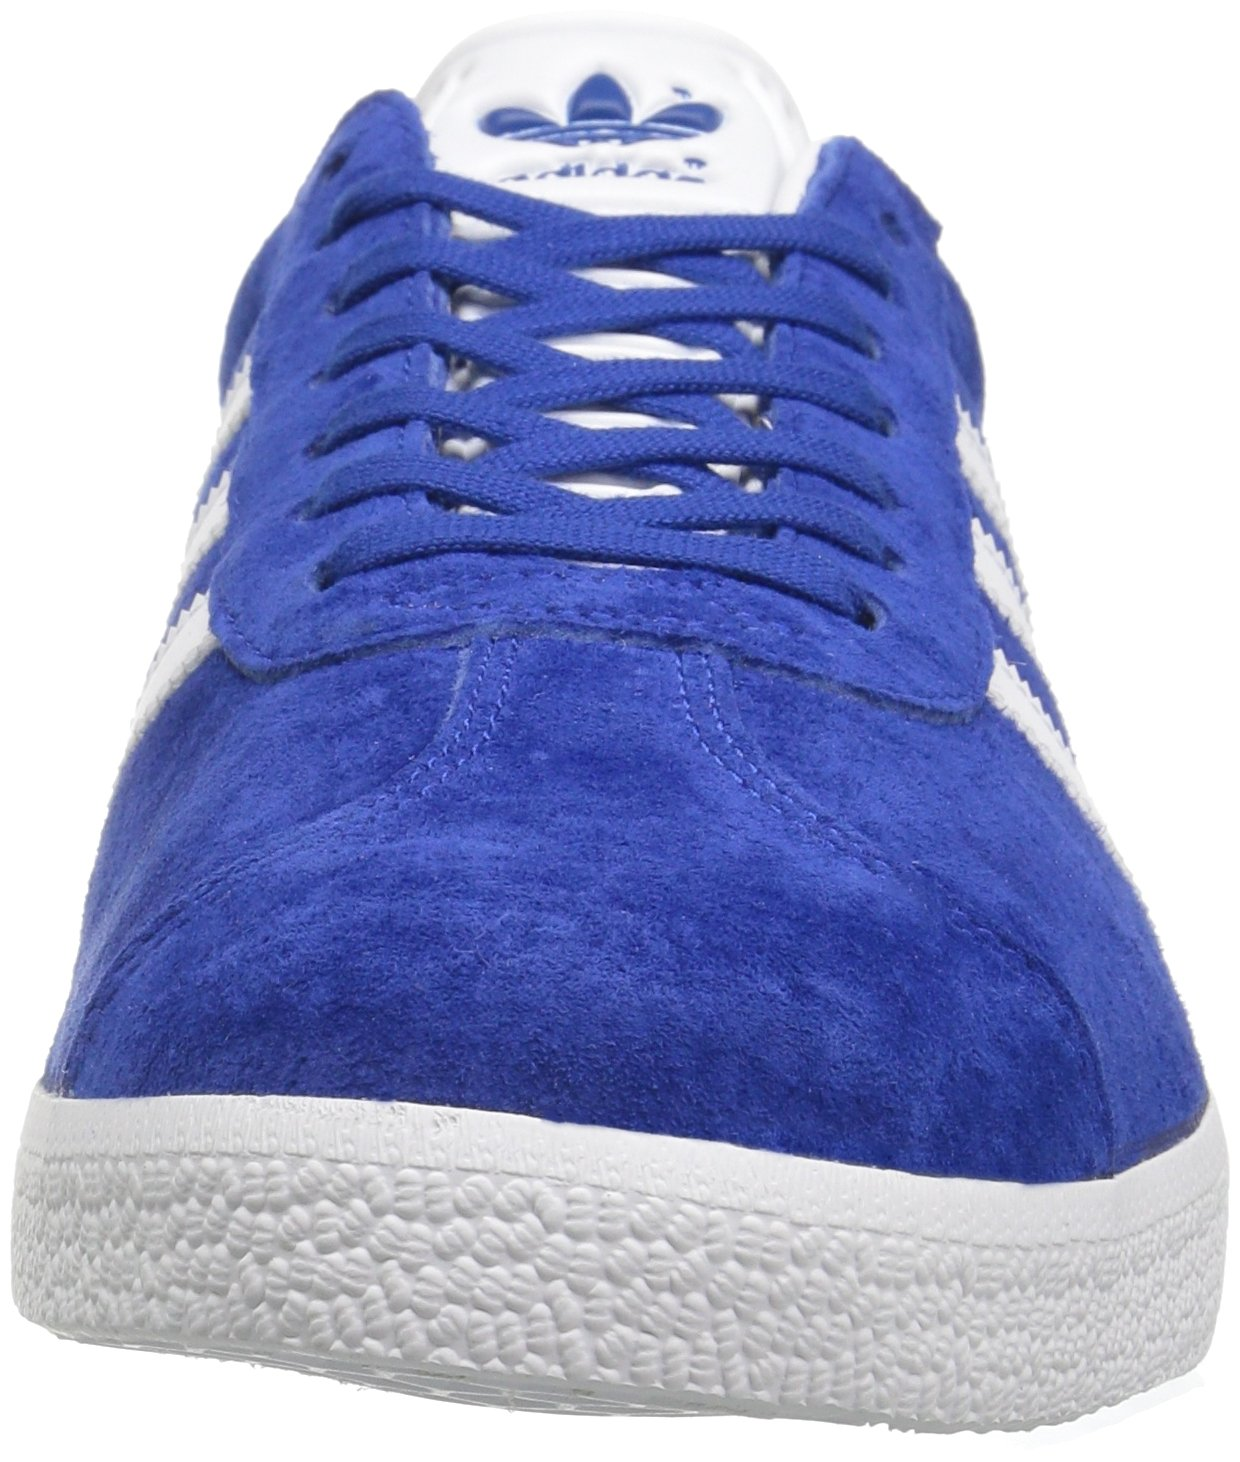 Adidas Adidas Gold Män Gazelle 19992 Casual Män Sneakers/ 19992 Collegiate Royal ebdd3dd - allergistofbrug.website